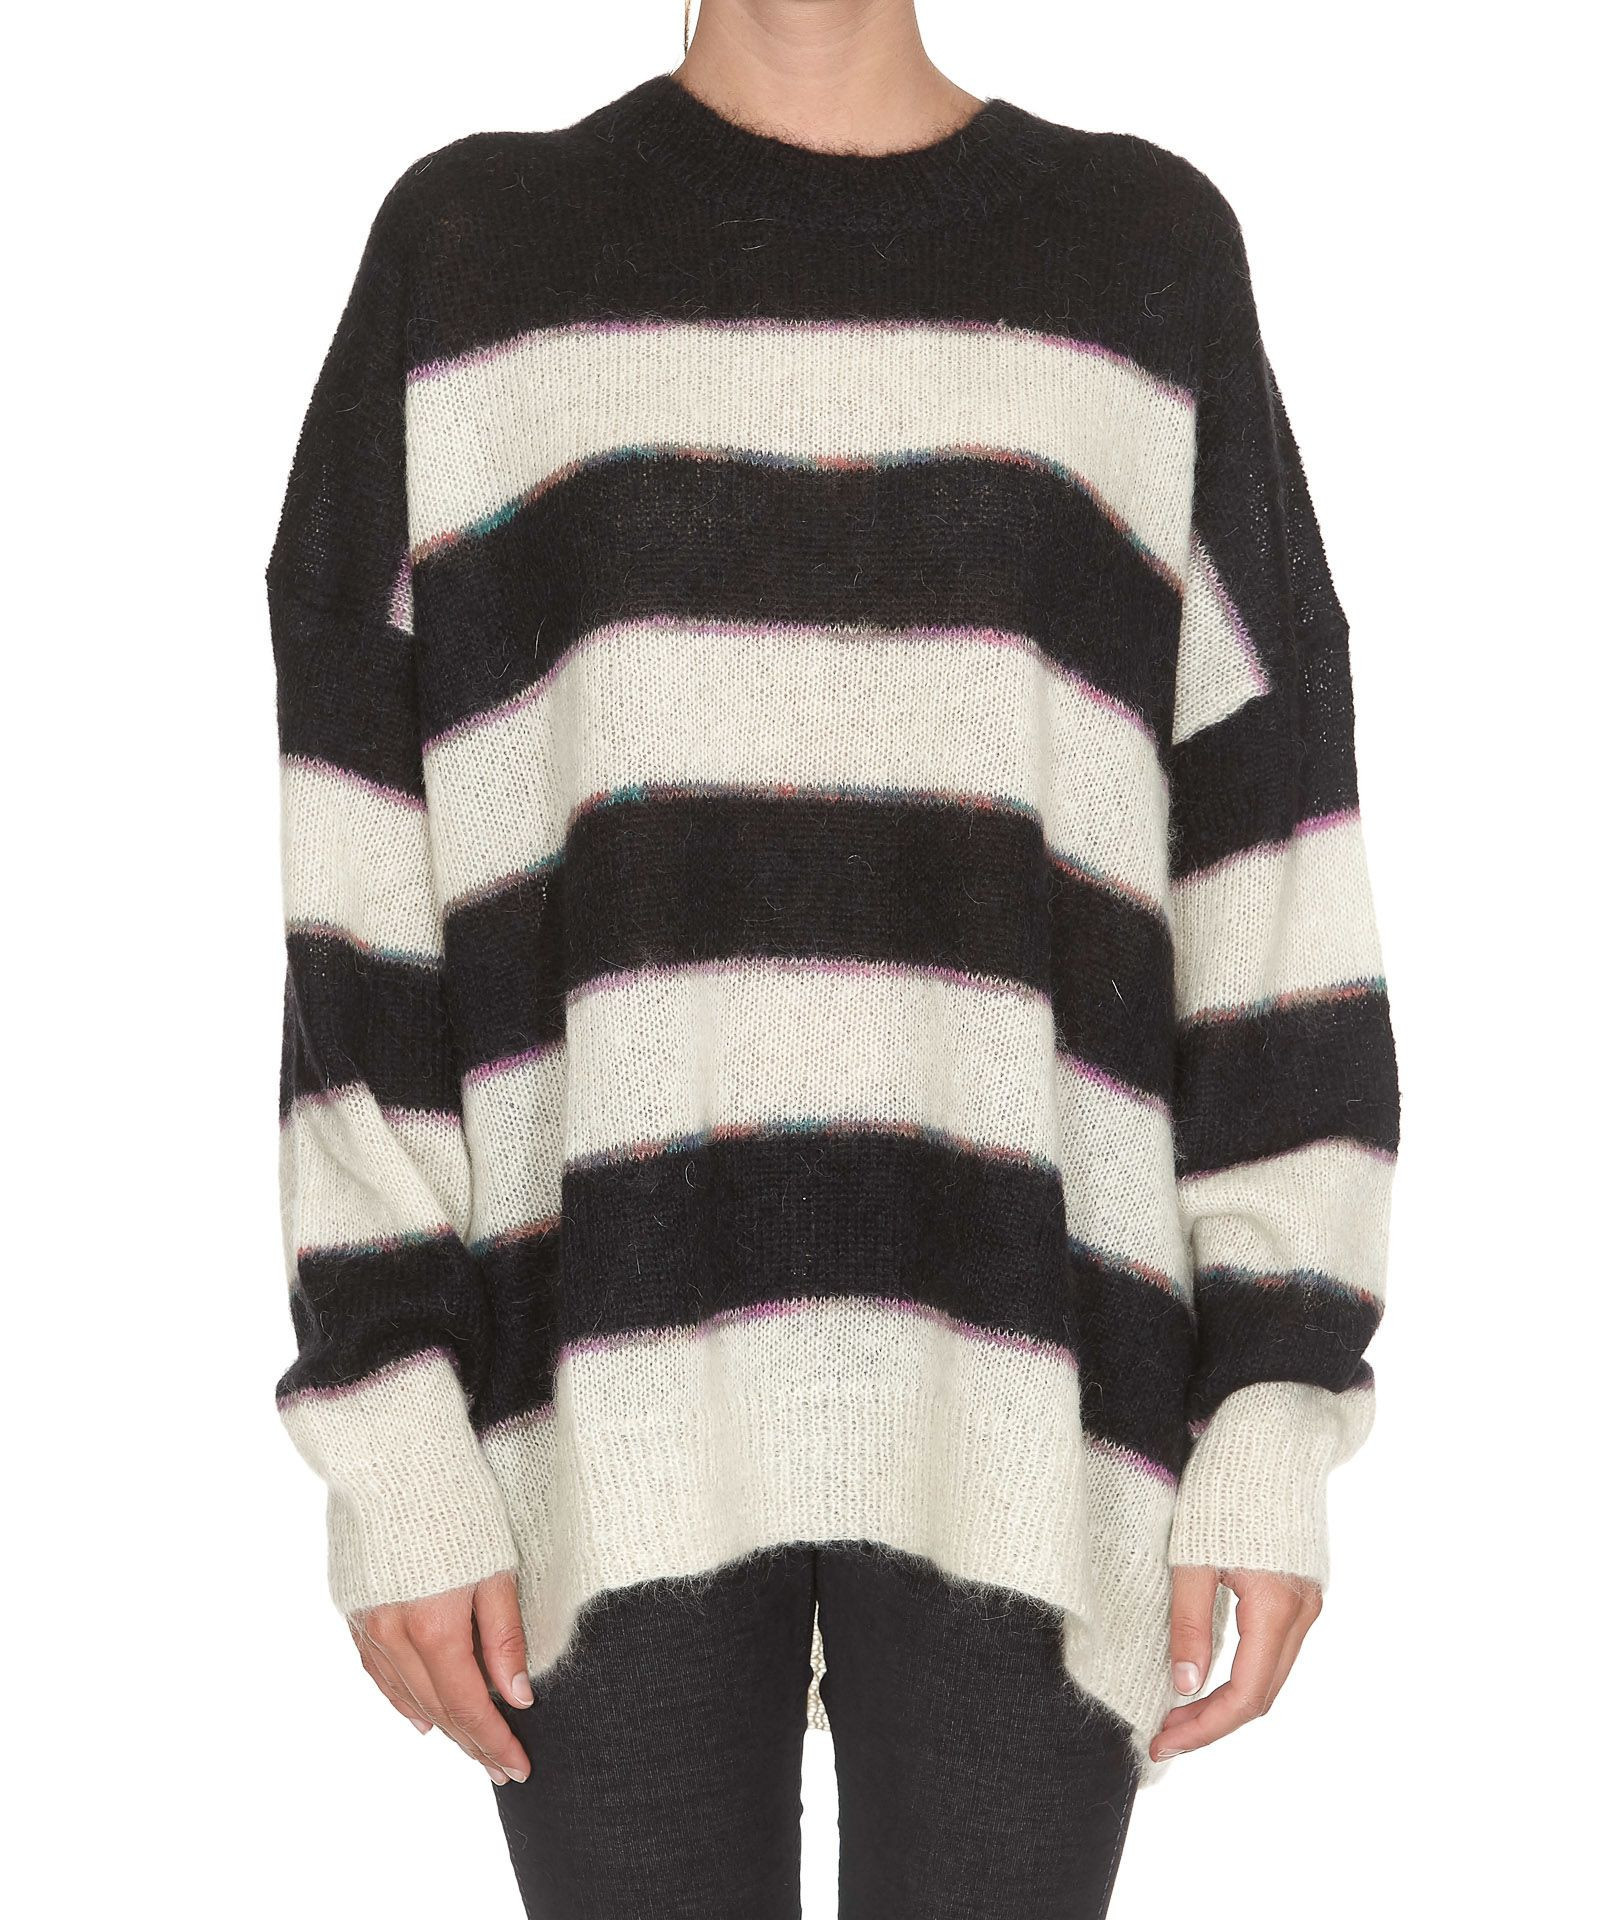 Black Long Sleeve Mesh Bodycon Club Wear Sexy Mini Dress lml6163 - lol-malls - Trustful Online Shopping for Women Dresses